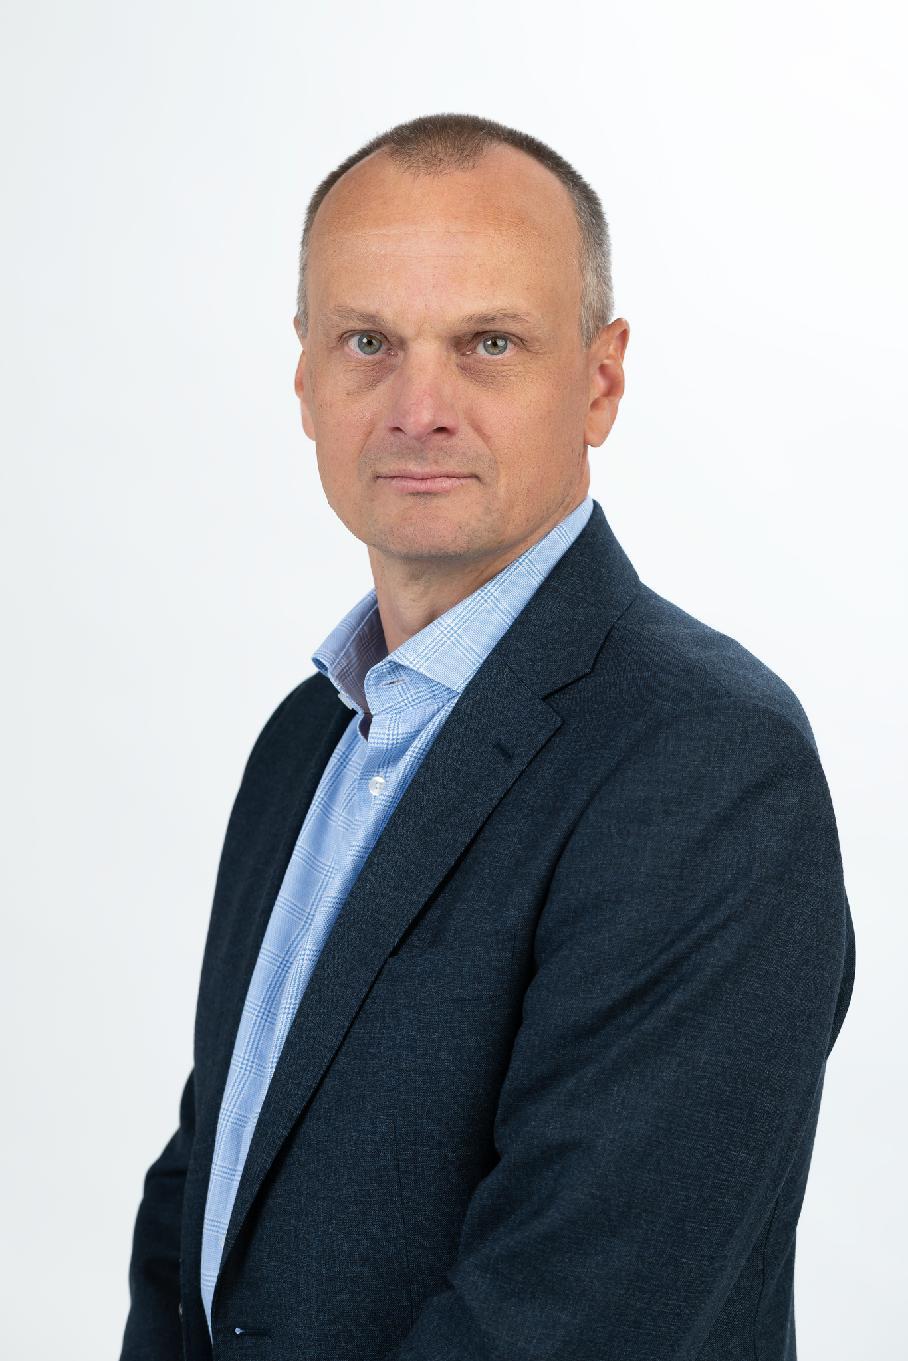 Mats Lundström yrityspalvelut yhteystiedot företagstjänster kontaktuppgifter Raseborg Raasepori Kemiönsaari Kimitoön